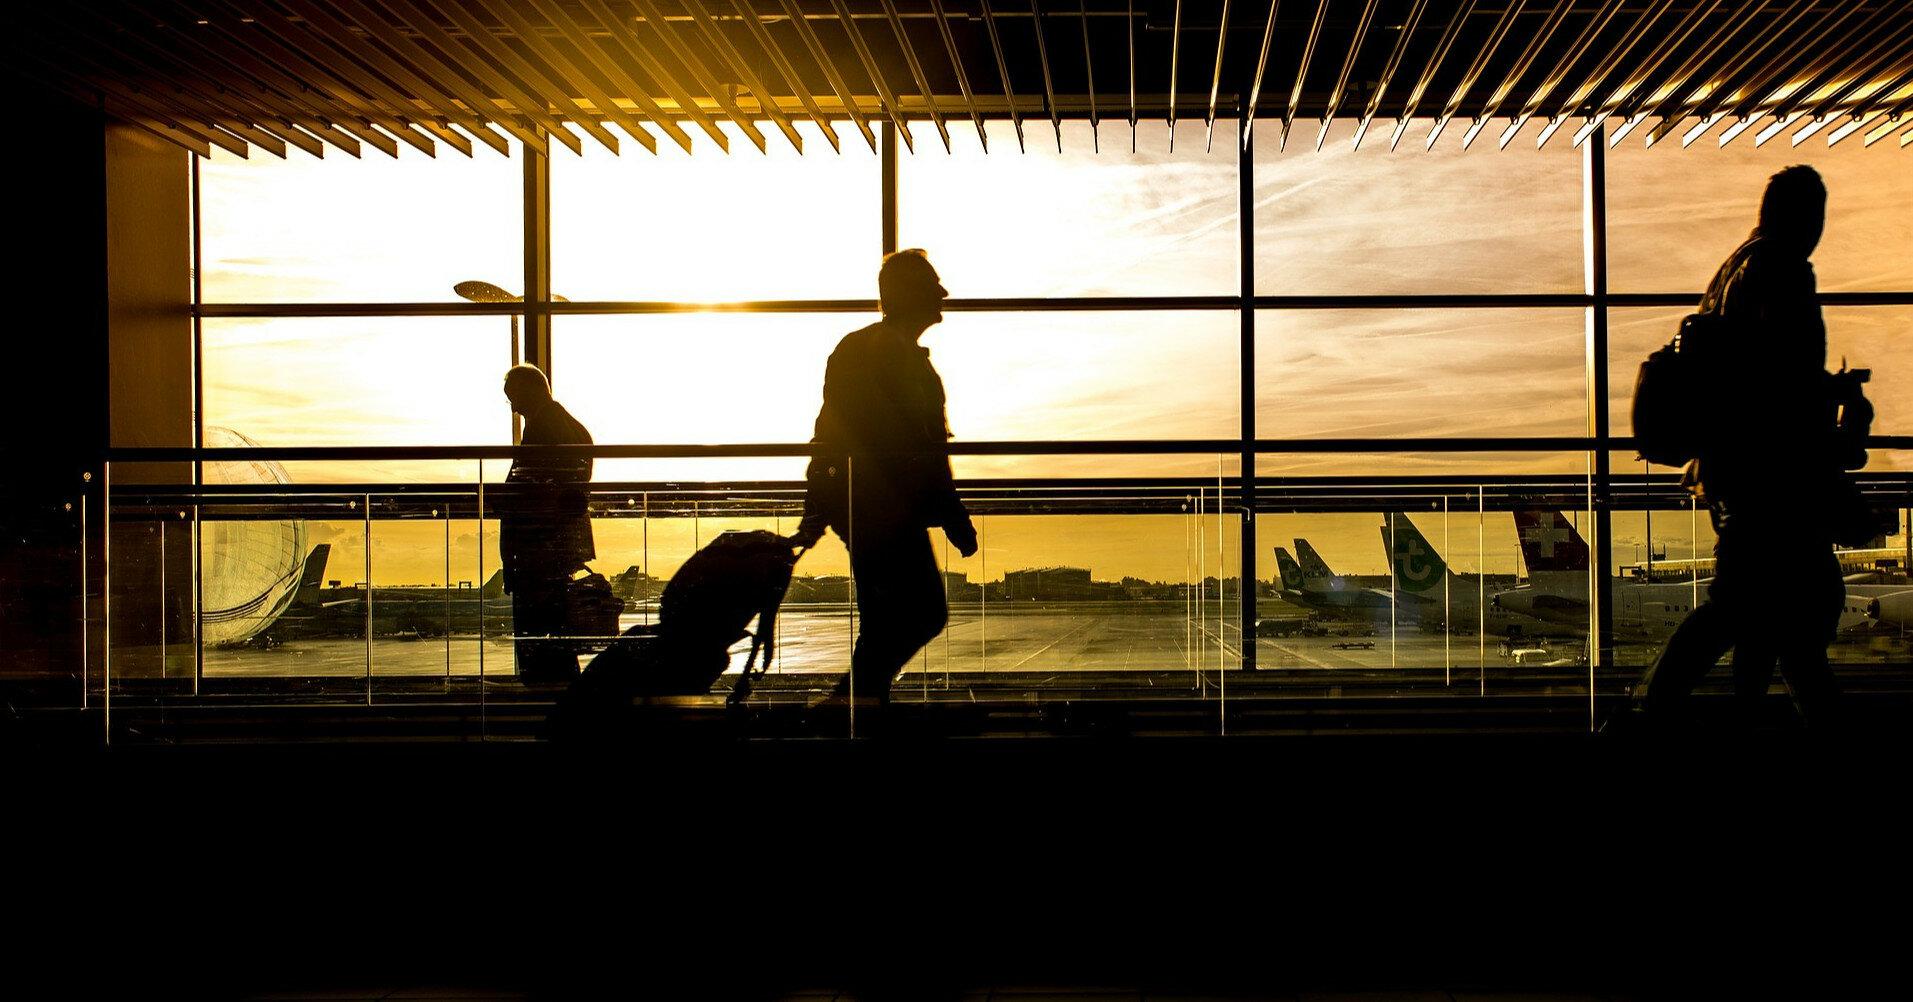 ВОЗ дала рекомендации по путешествиям